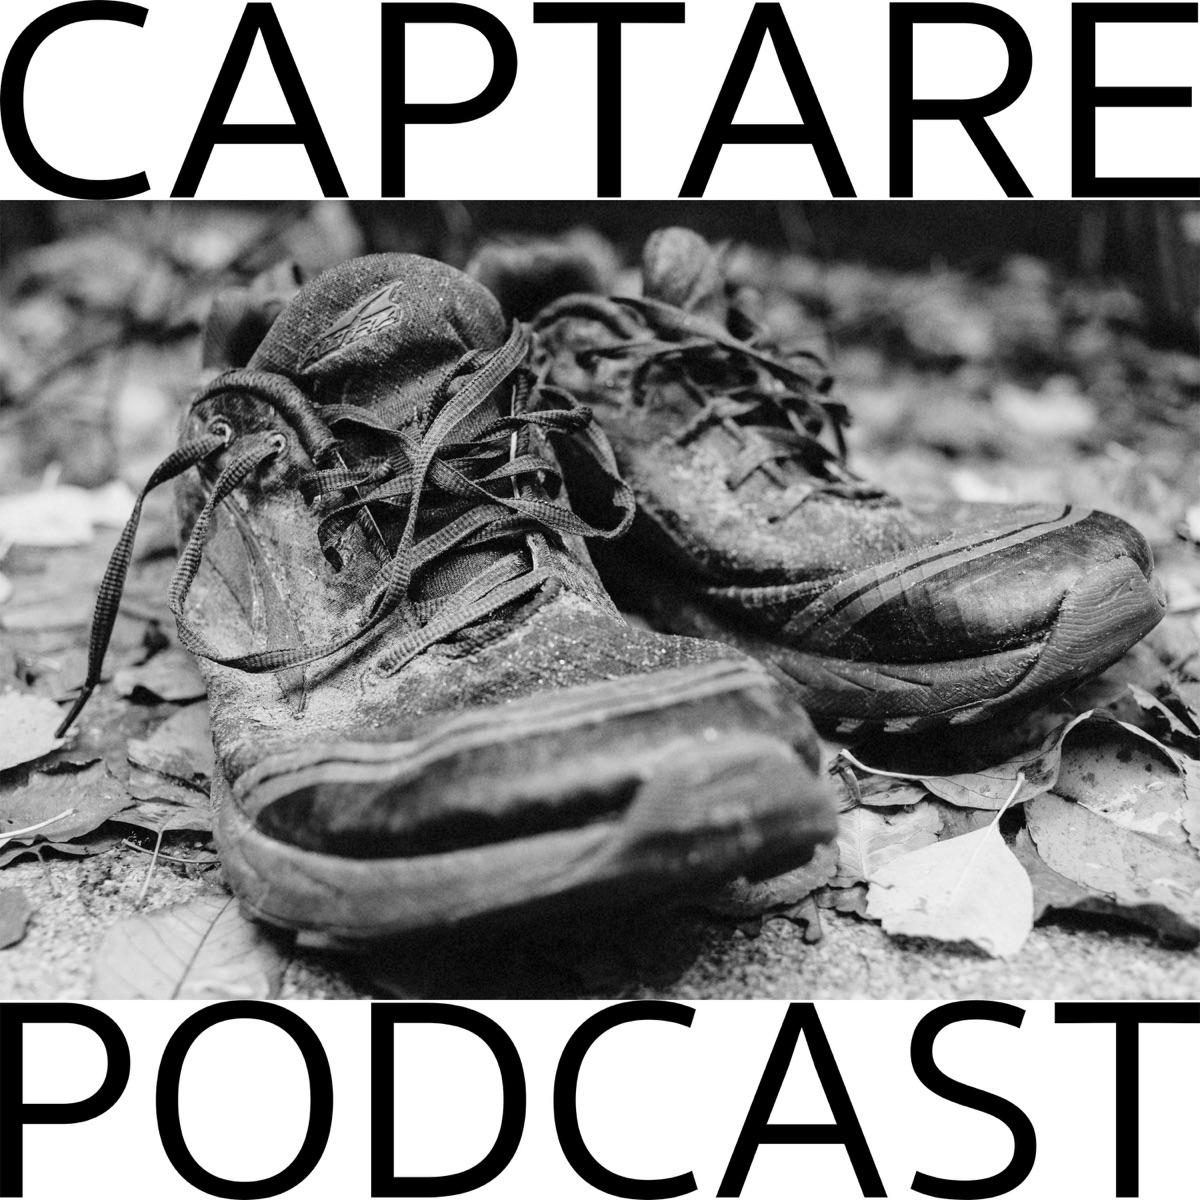 Captare Podcast